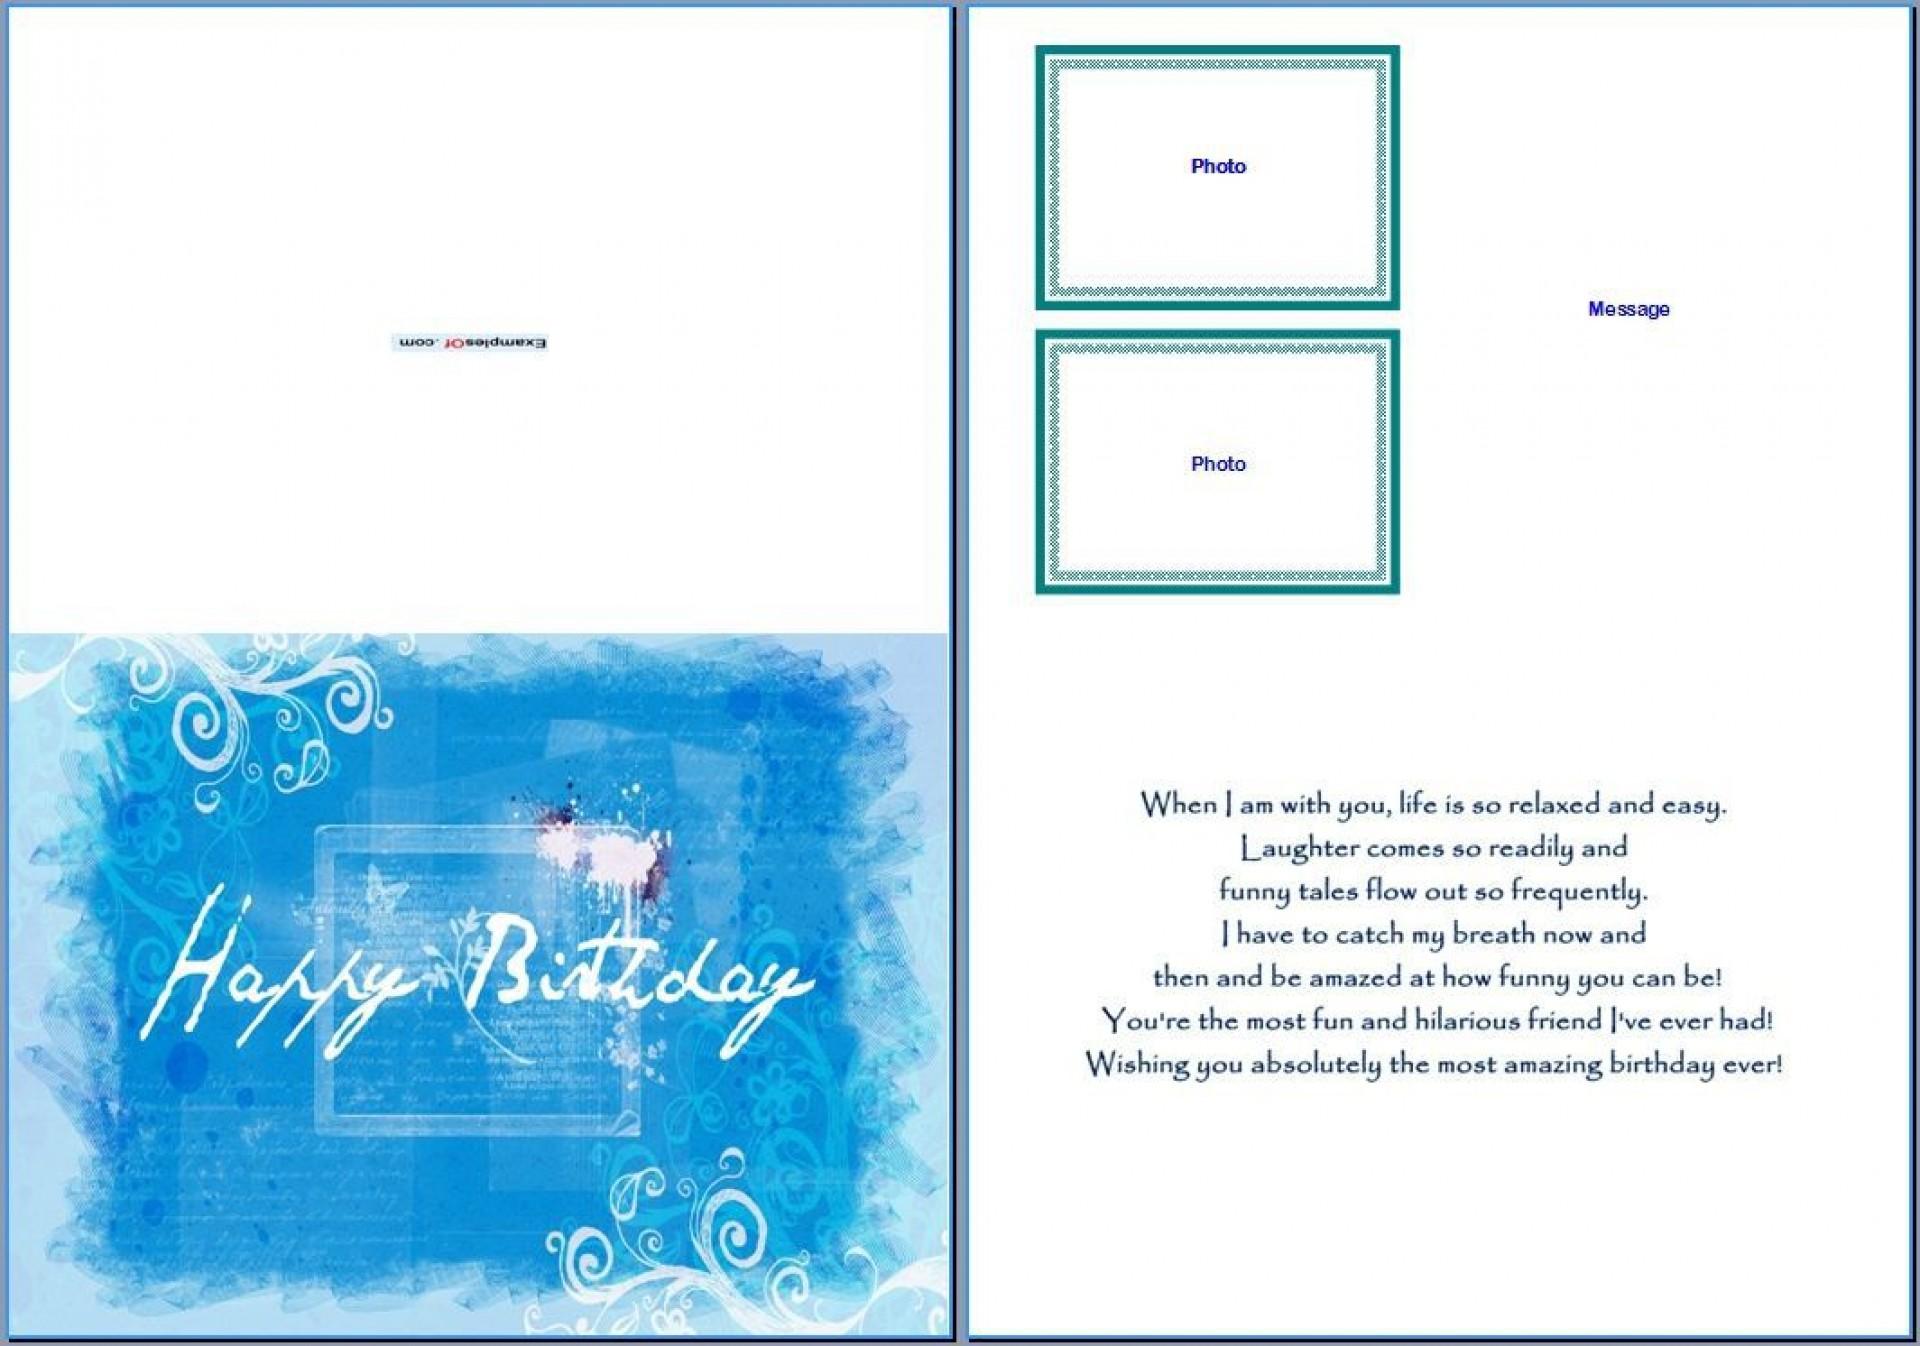 008 Sensational Microsoft Word Card Template Image  Birthday Download Busines Free1920